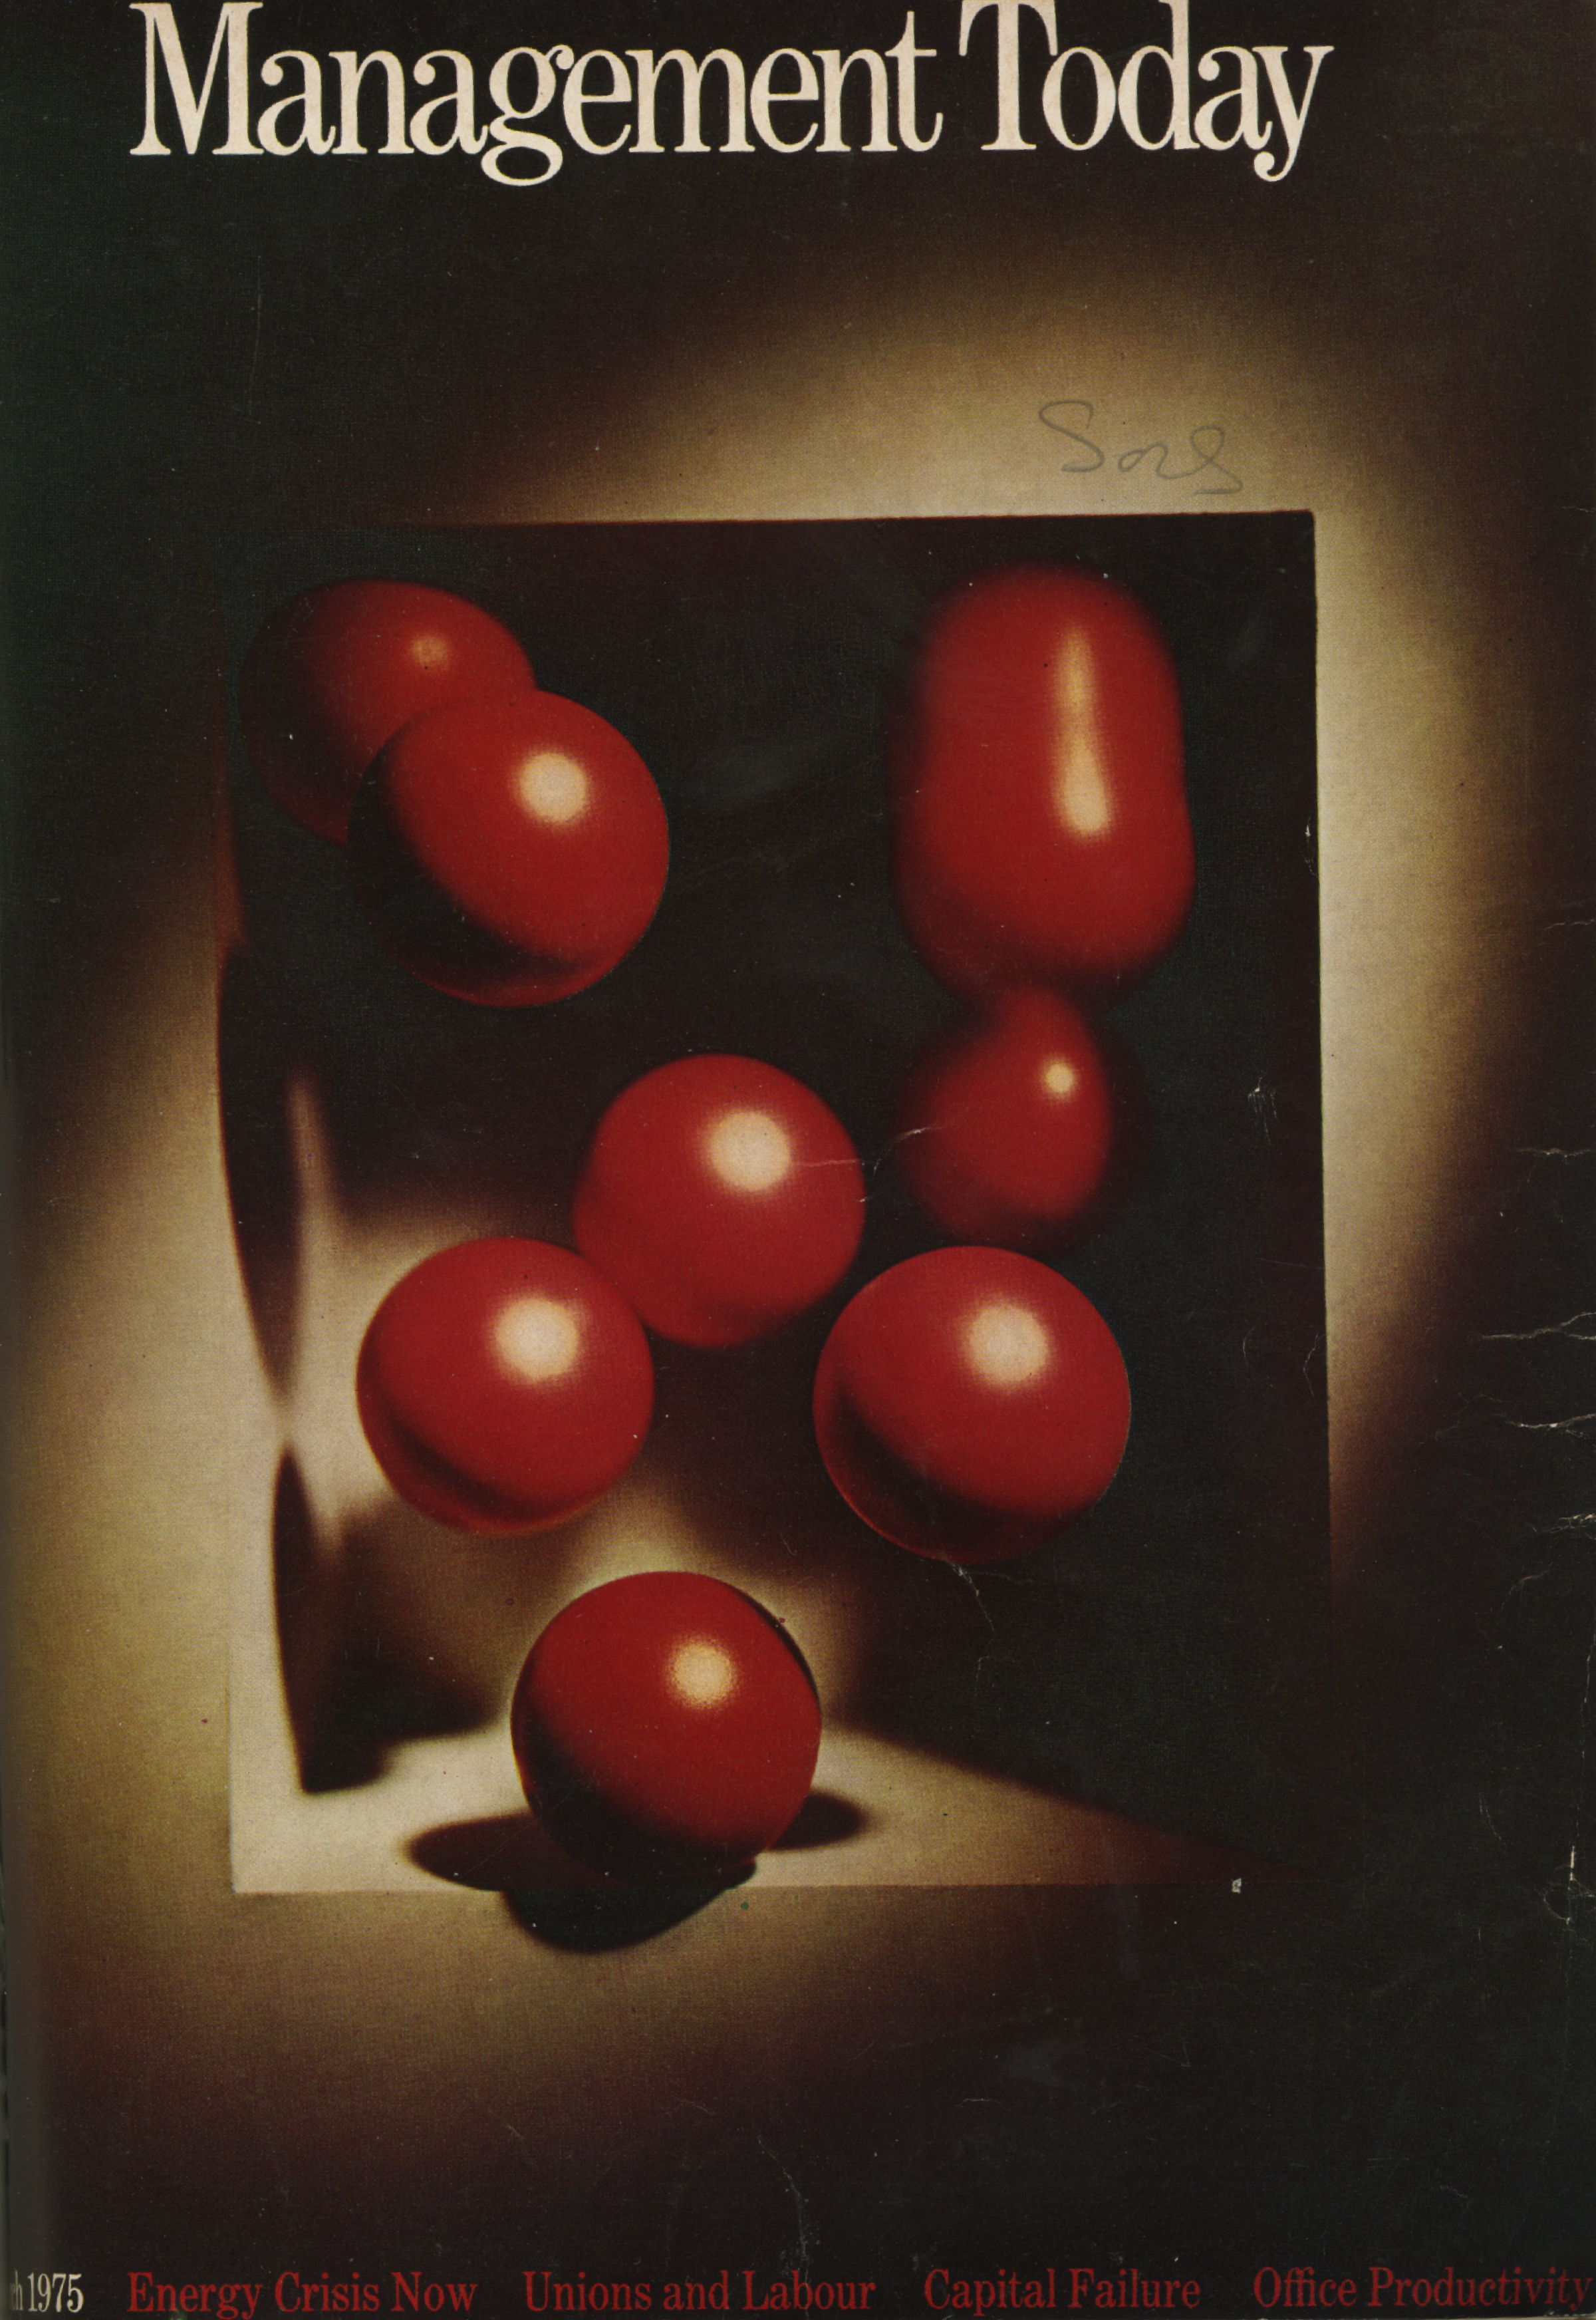 Lester Bookbinder, Management Today 'Red Balls'**-01